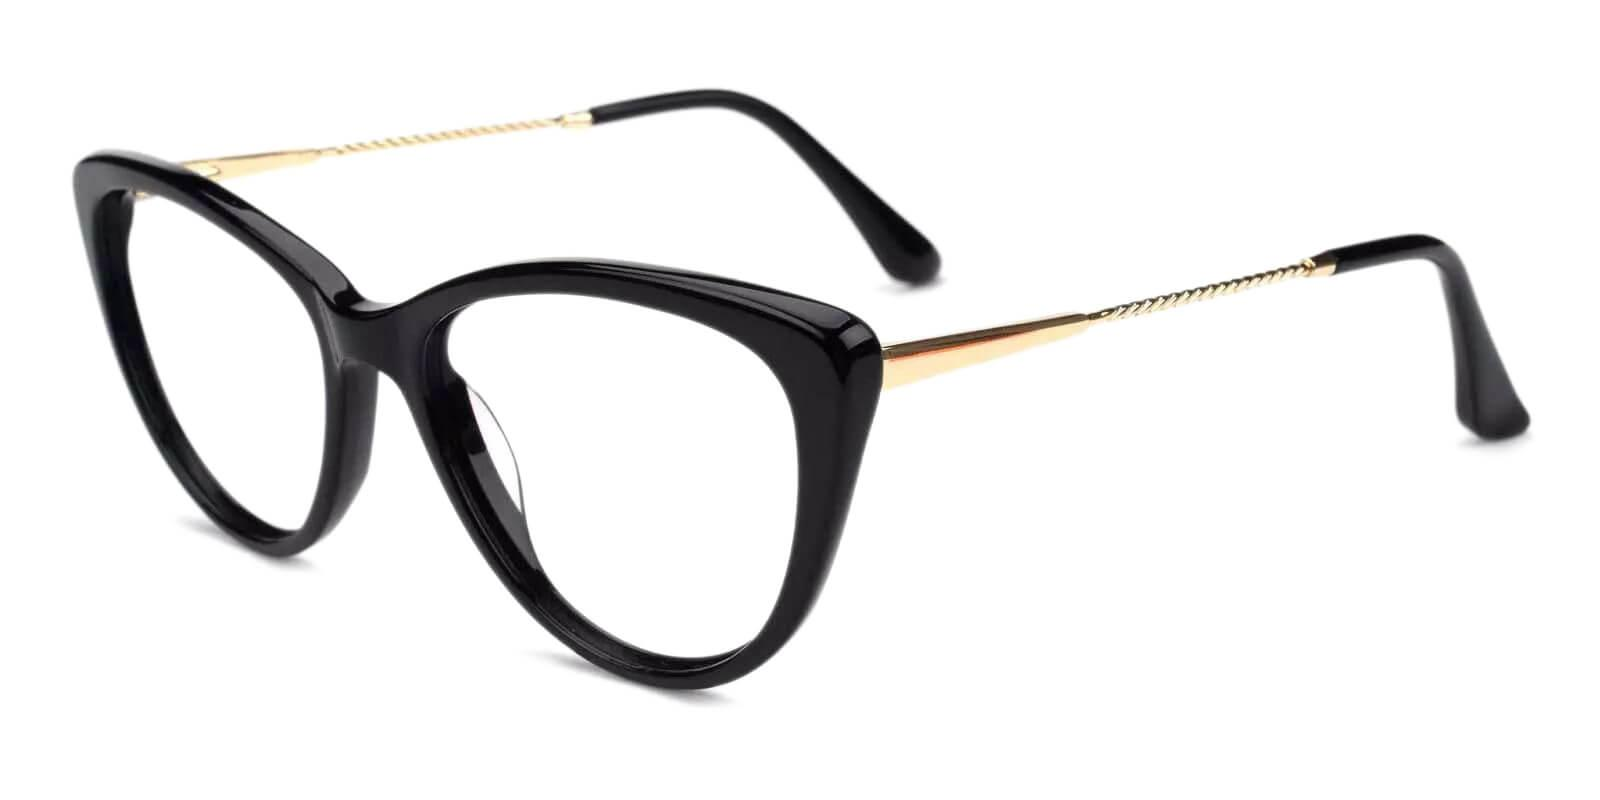 Satin Black Acetate , Metal Eyeglasses , Fashion , SpringHinges , UniversalBridgeFit Frames from ABBE Glasses